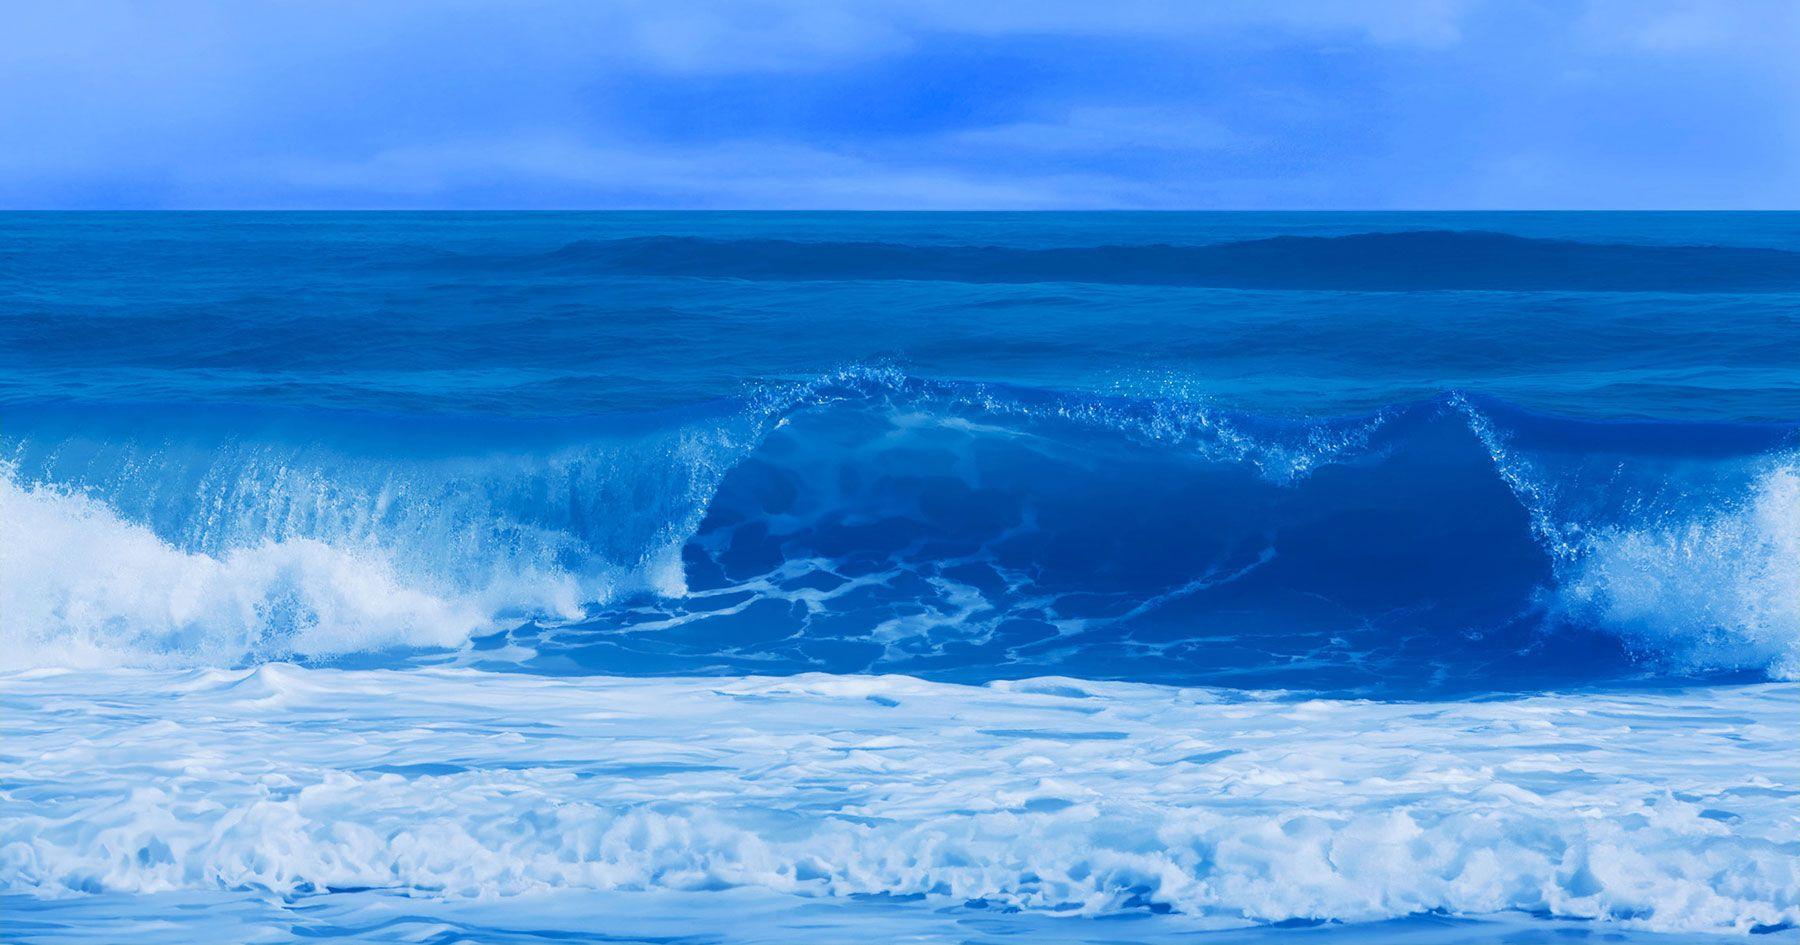 Emerald Wave in Blue